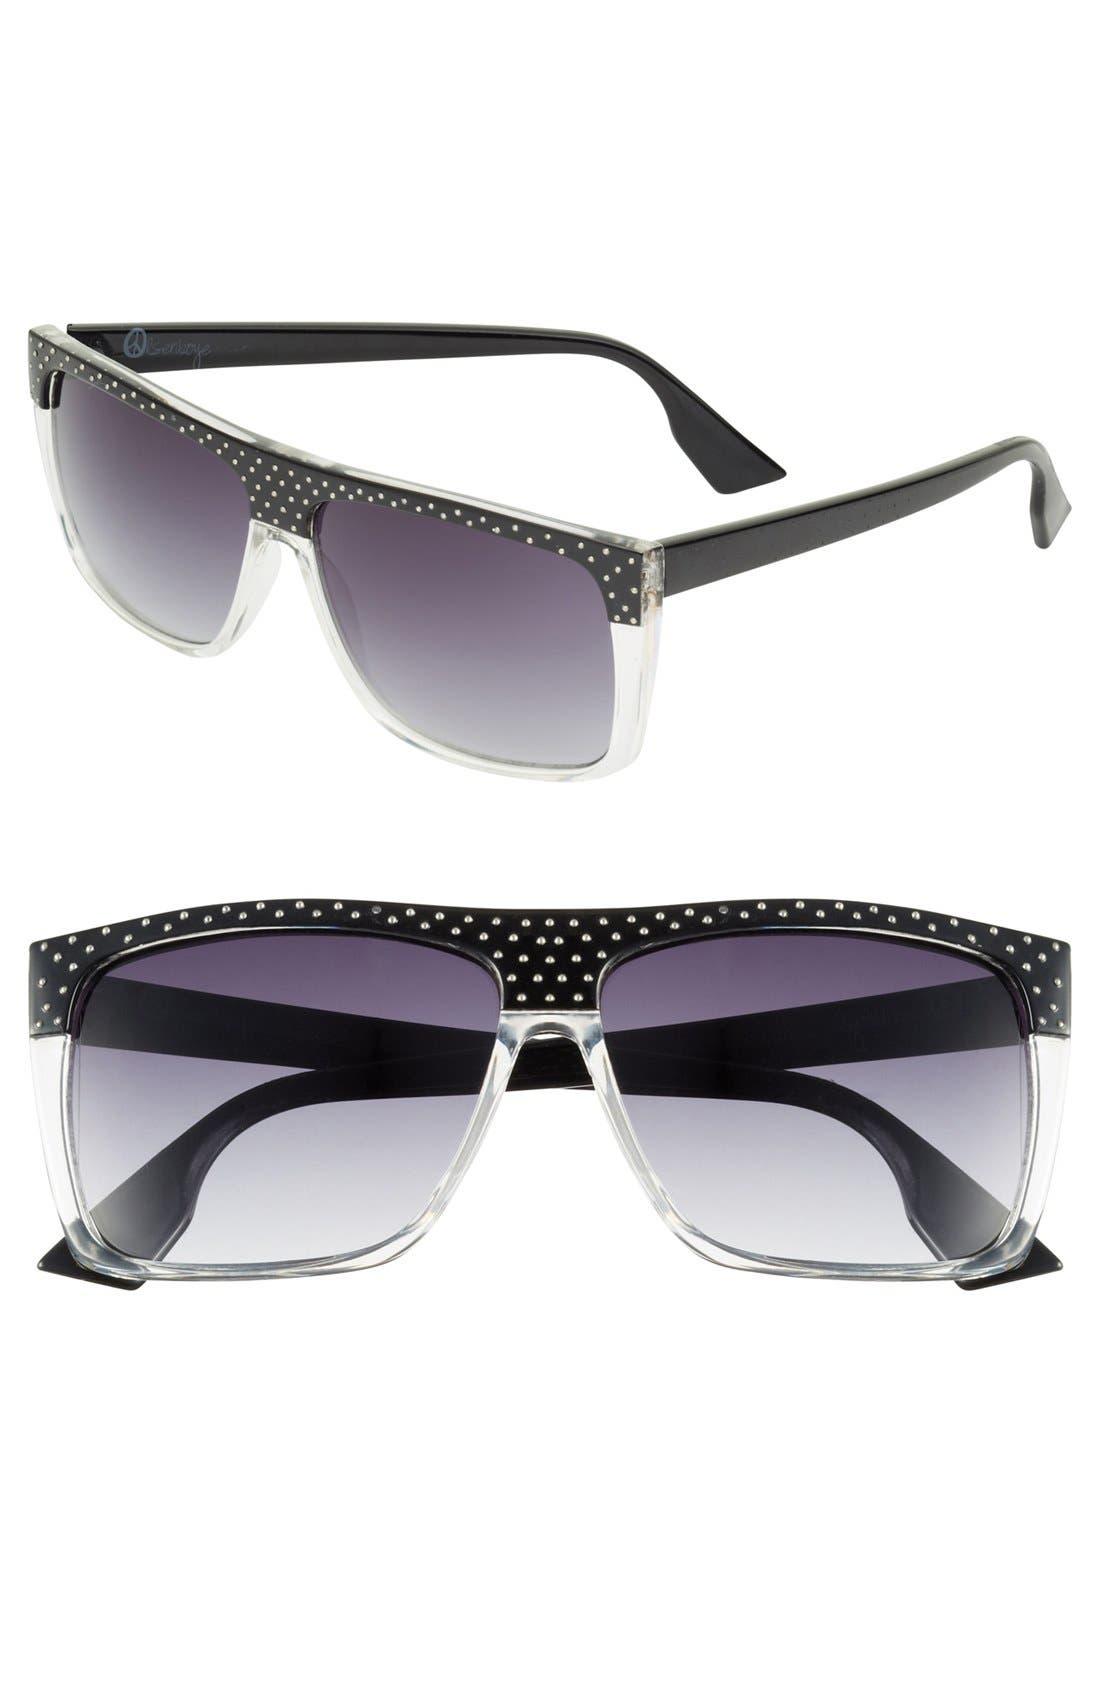 Alternate Image 1 Selected - Outlook Eyewear 'Guggenheim' 59mm Sunglasses